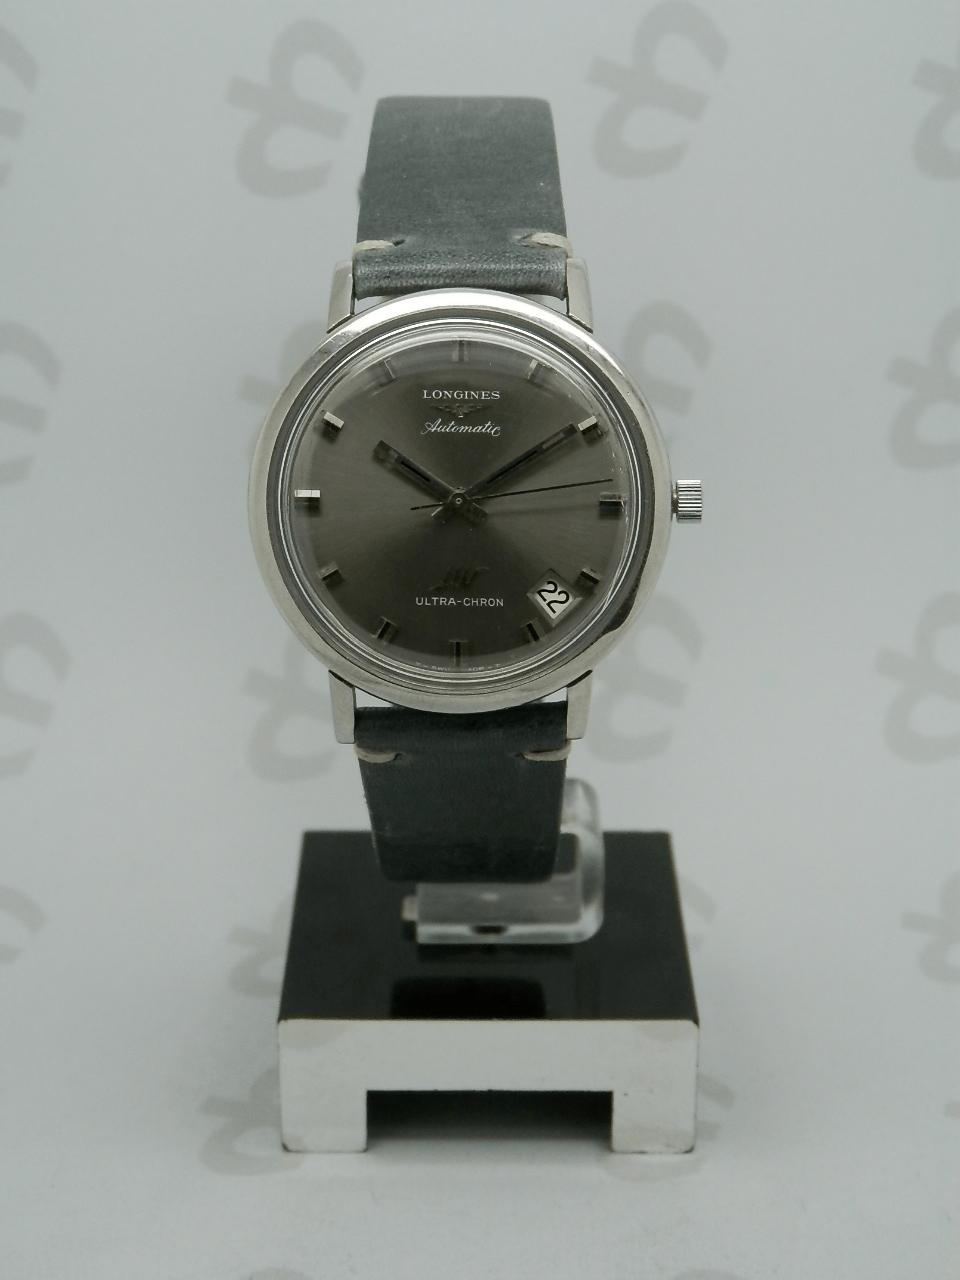 Longines Ultra-Chron Date Acero Automático Vintage